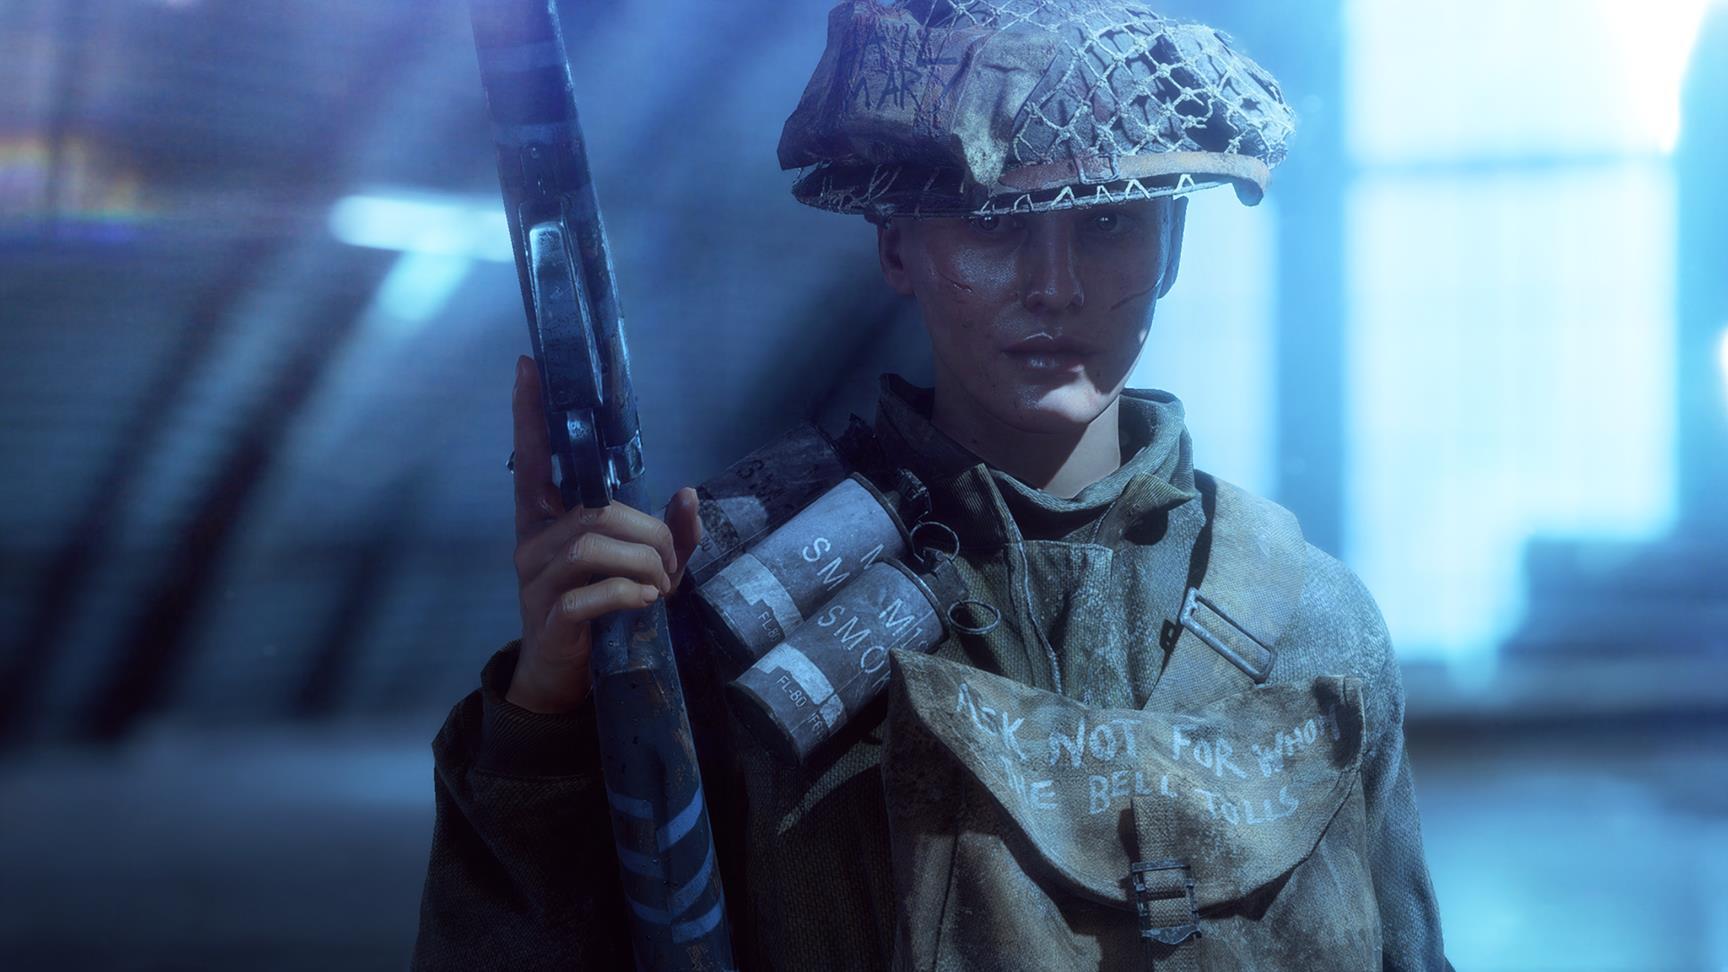 Battlefield 5 - best weapons for Assault, Medic, Support